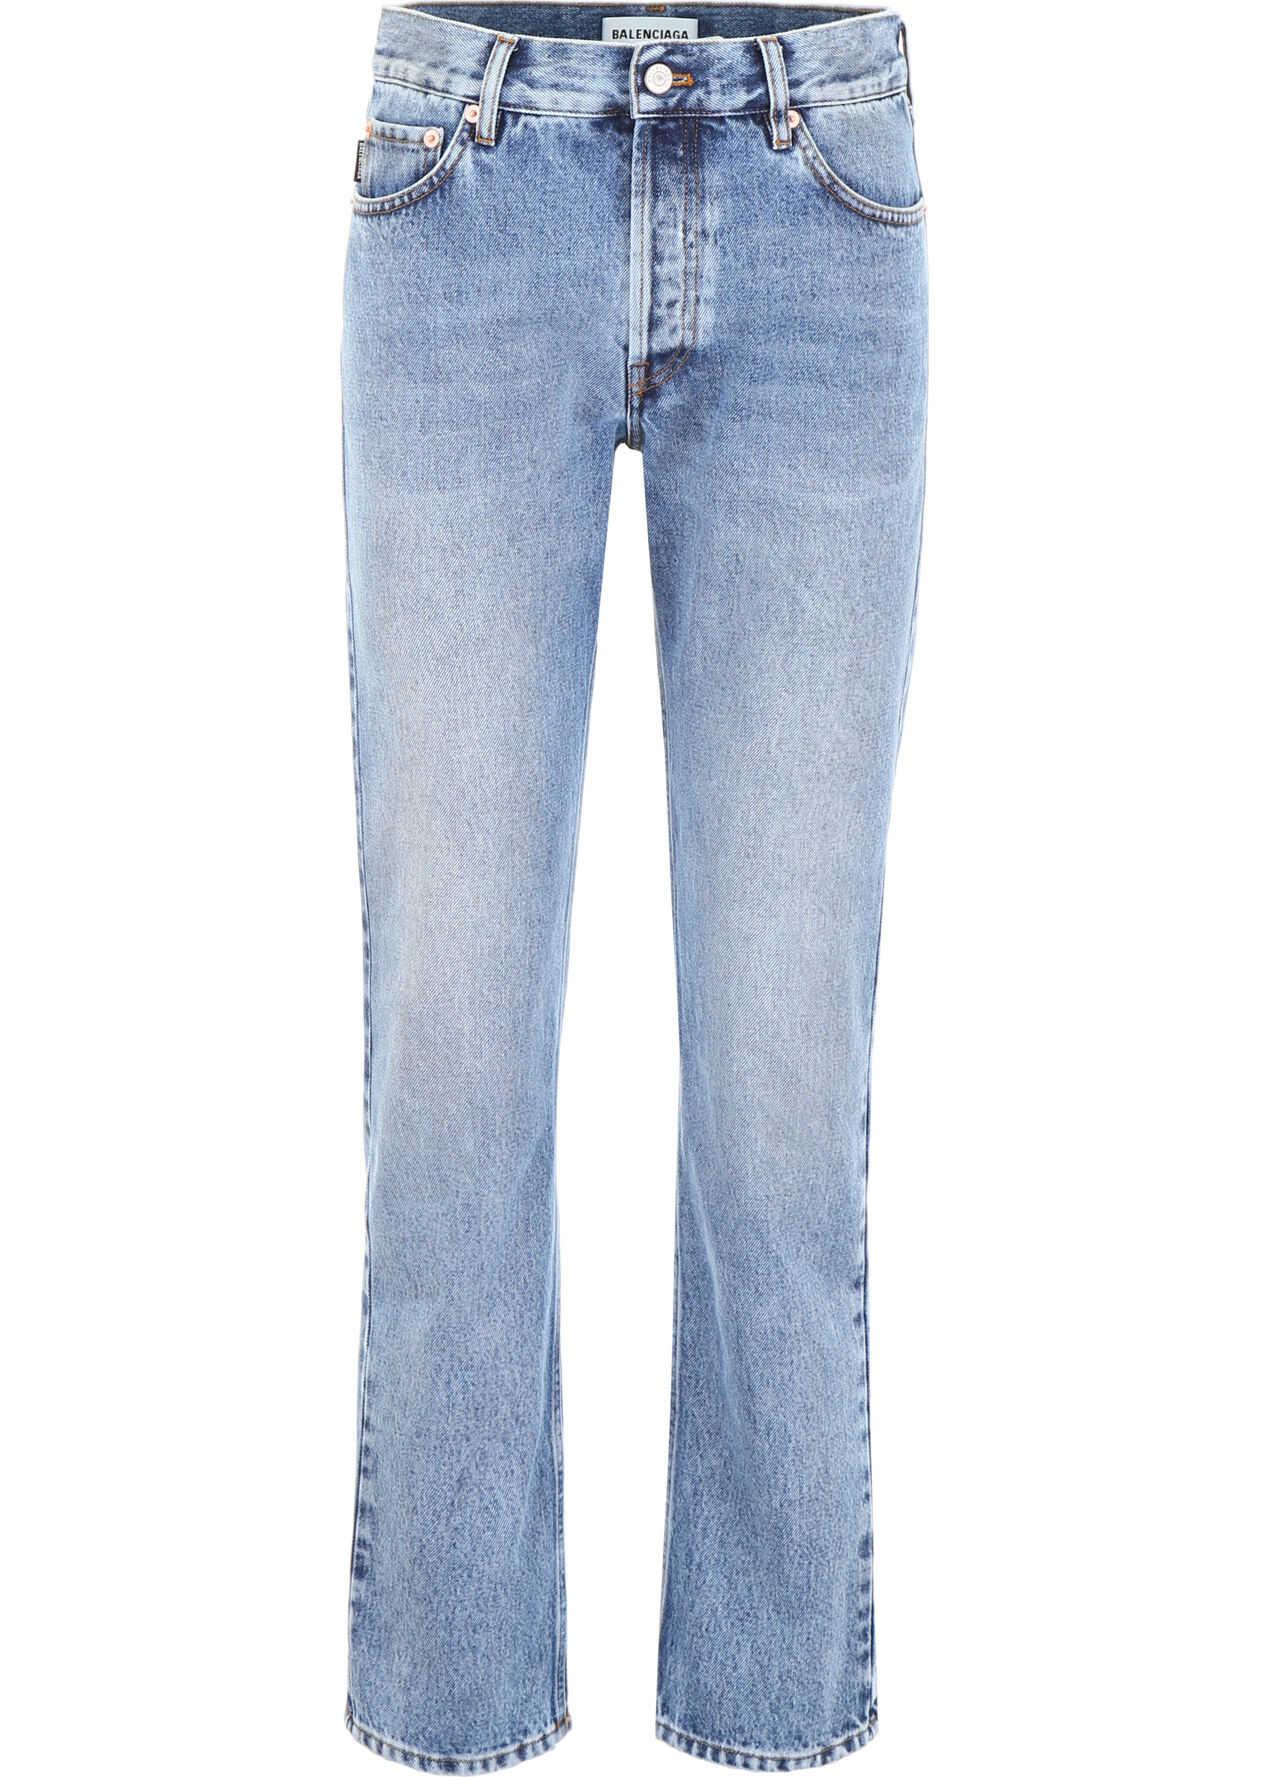 Balenciaga Ripped Jeans LIGHT BLUE